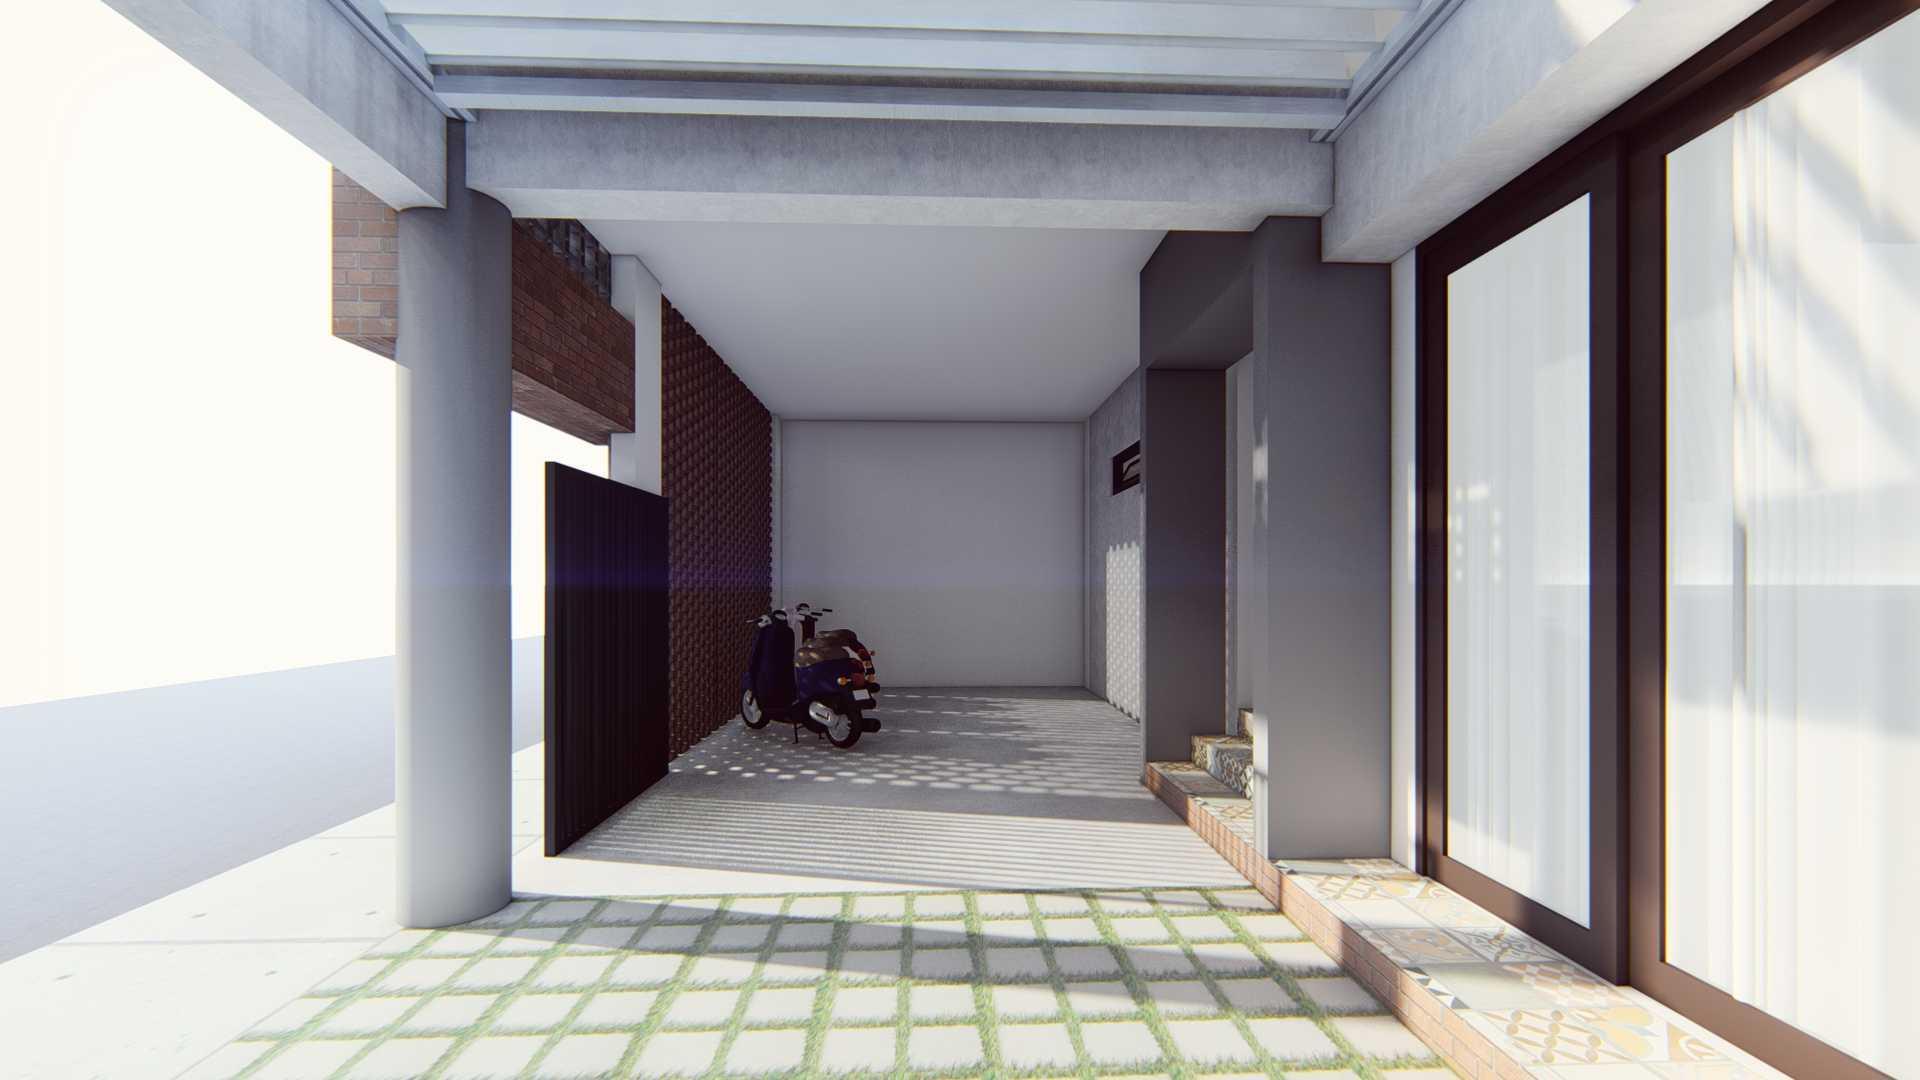 Astabumi Studio Green Paviliun Cilacap Cilacap, Kabupaten Cilacap, Jawa Tengah, Indonesia Kabupaten Sleman, Daerah Istimewa Yogyakarta, Indonesia Cv-Astabumi-Manunggal-Prakarsa-Green-Paviliun-Cilacap   106588